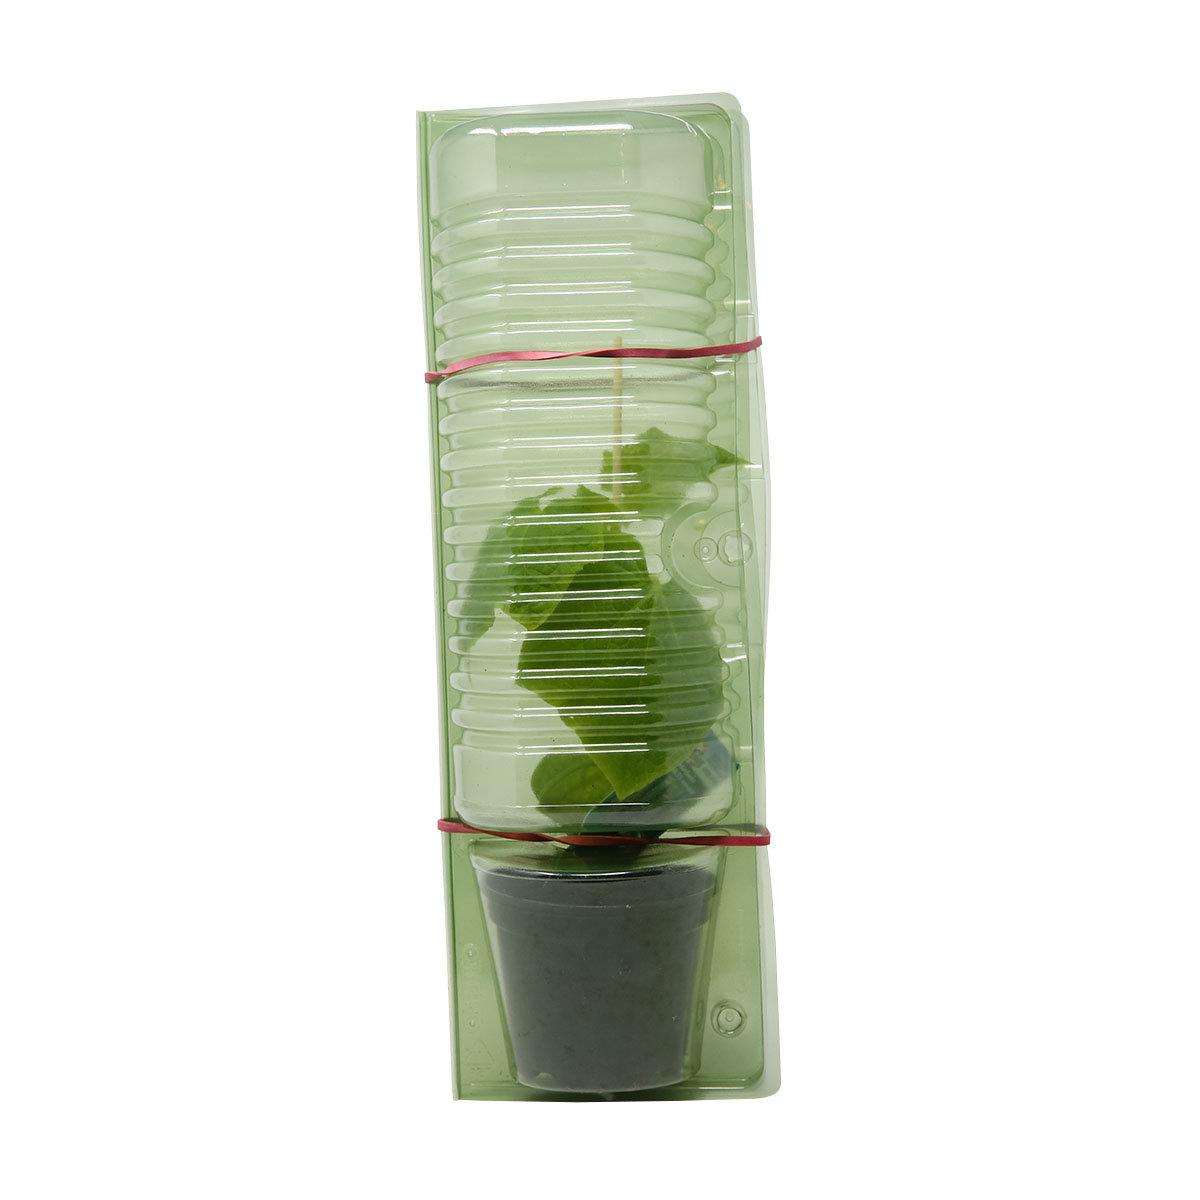 Gurkenpflanze Picolino F1, veredelt | #3